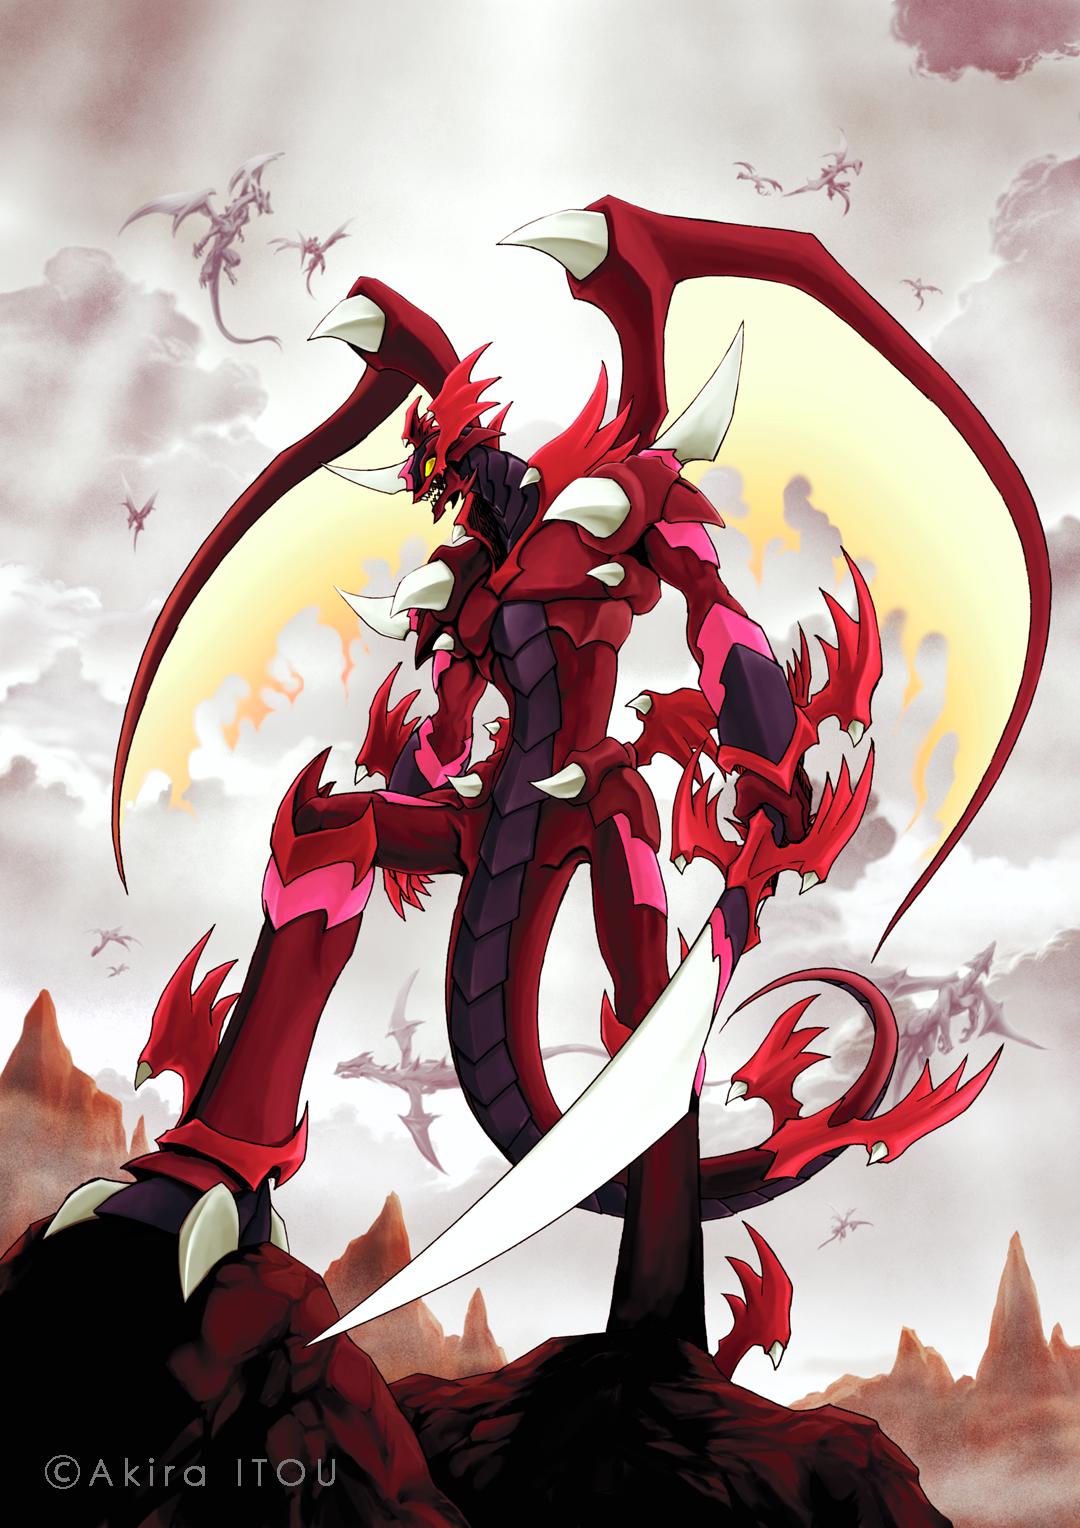 dragonic-overload